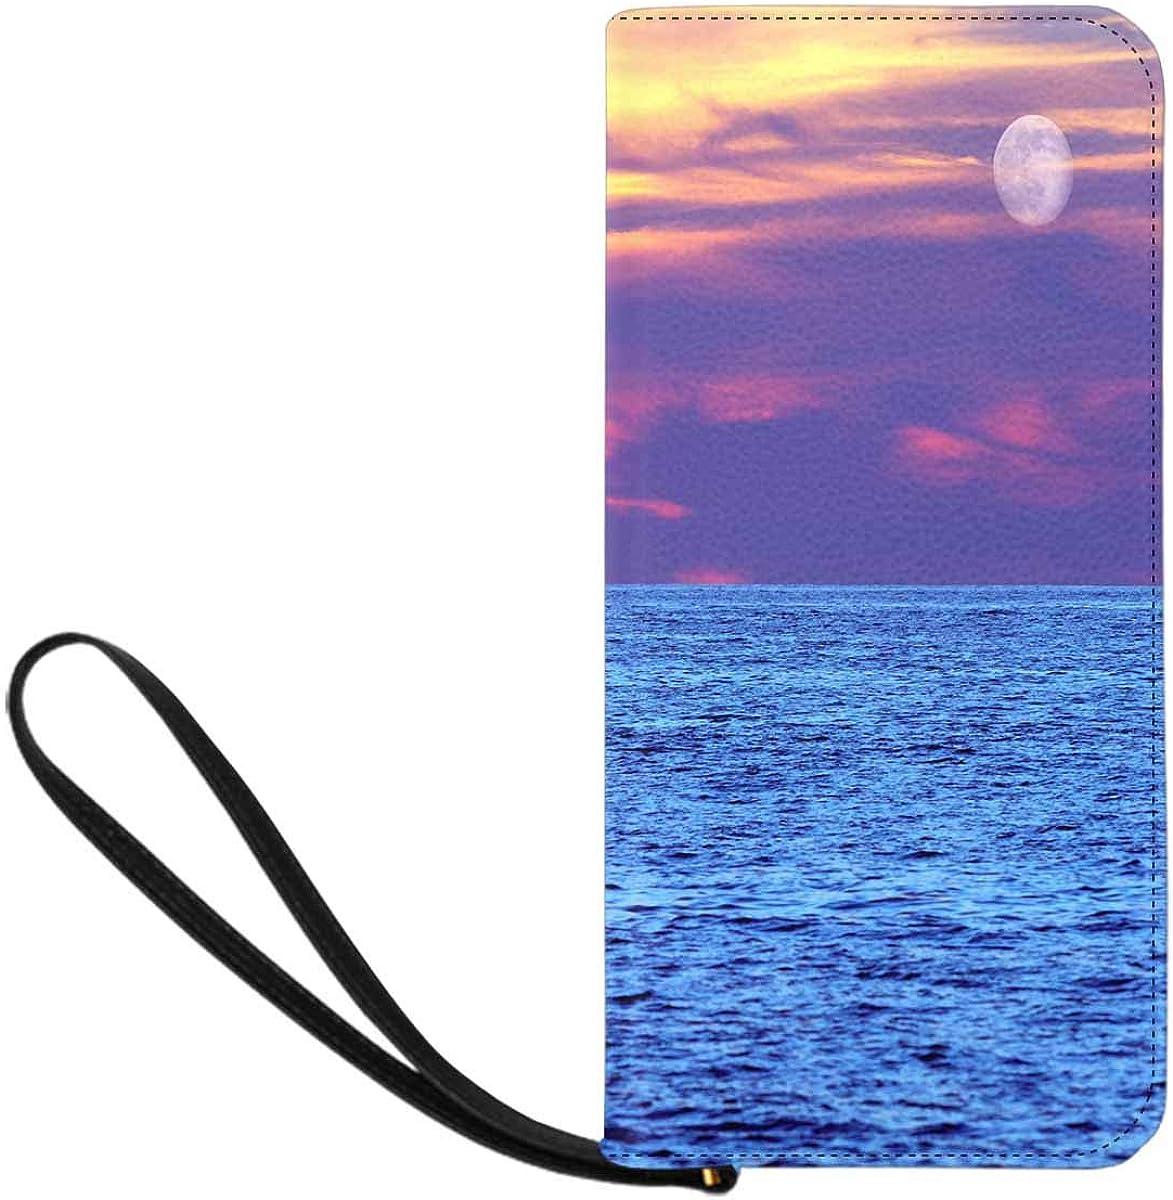 Sea Sunset Sailboat Womens RFID Blocking Zip Around Wallet Genuine Leather Clutch Long Card Holder Organizer Wallets Large Travel Purse